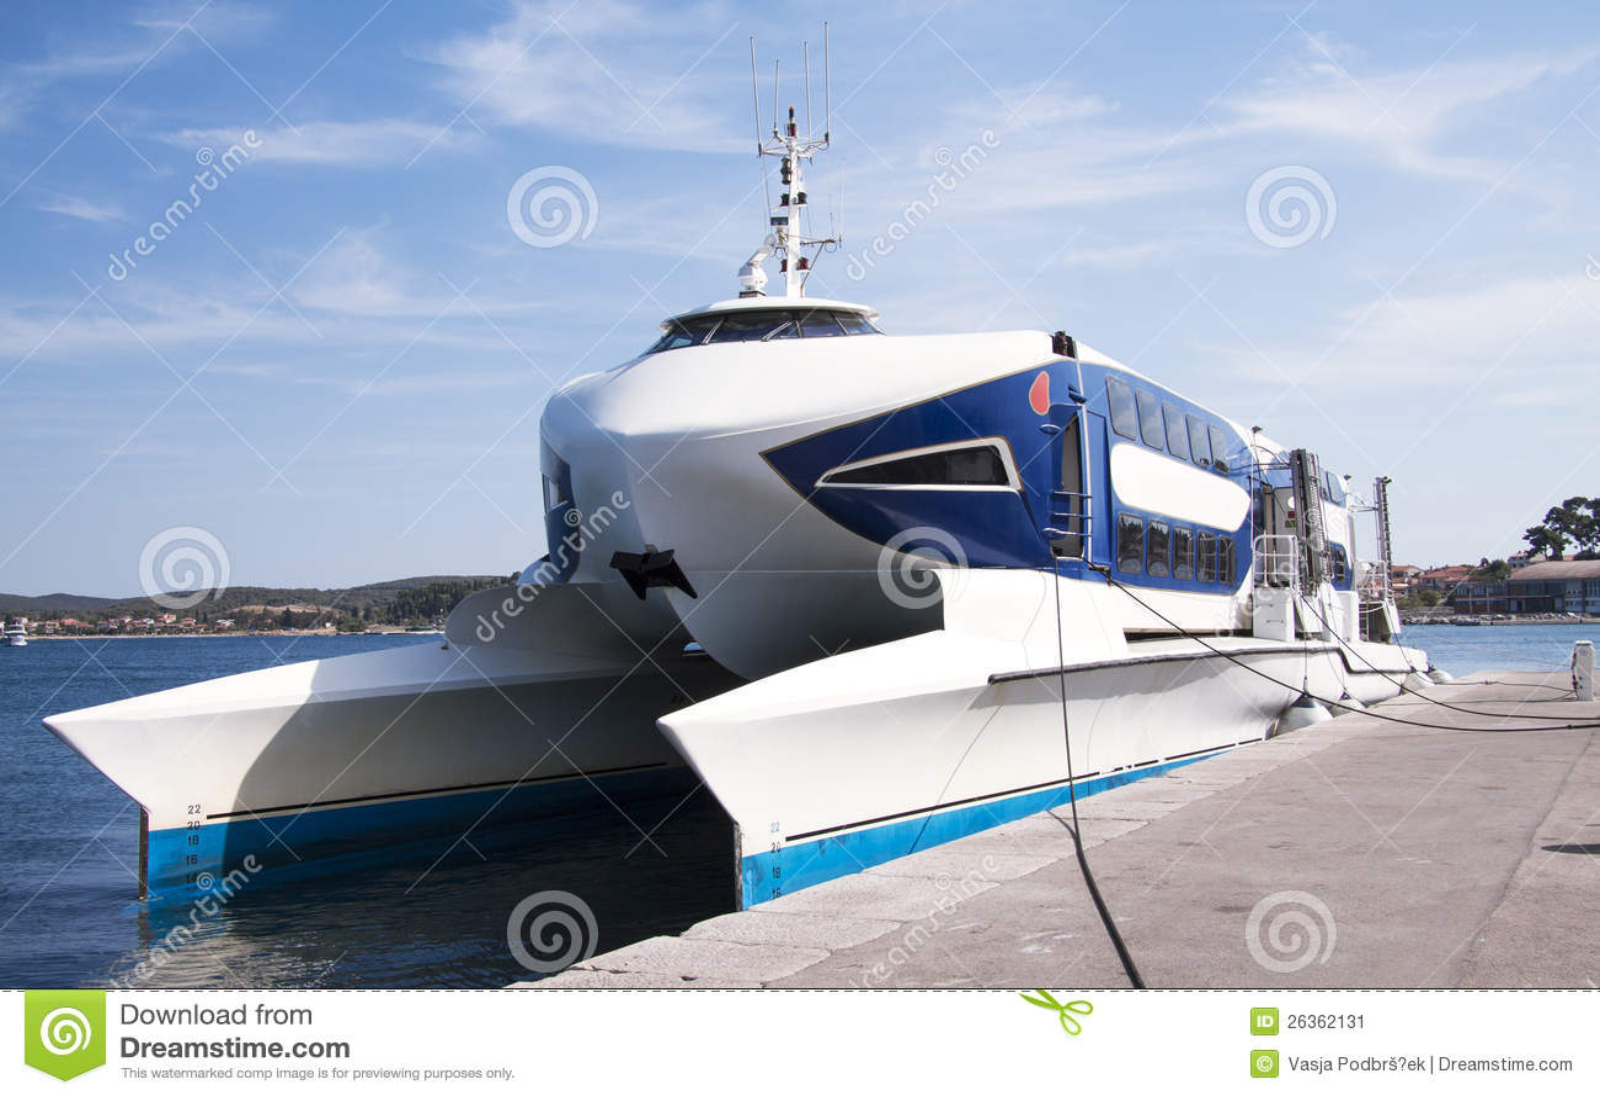 Fasten Katamaranboot